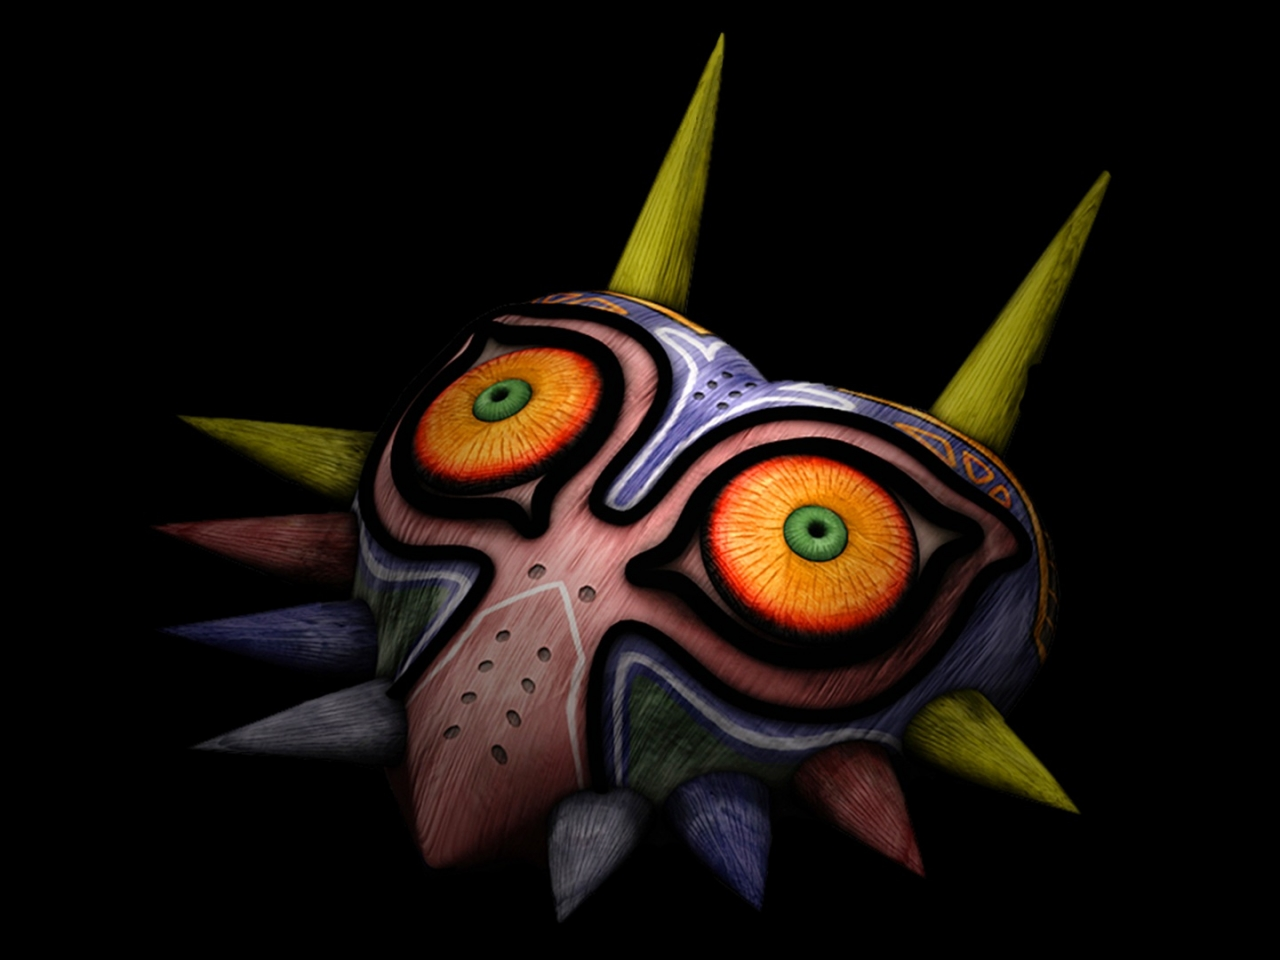 Majoras Mask - 1280x960